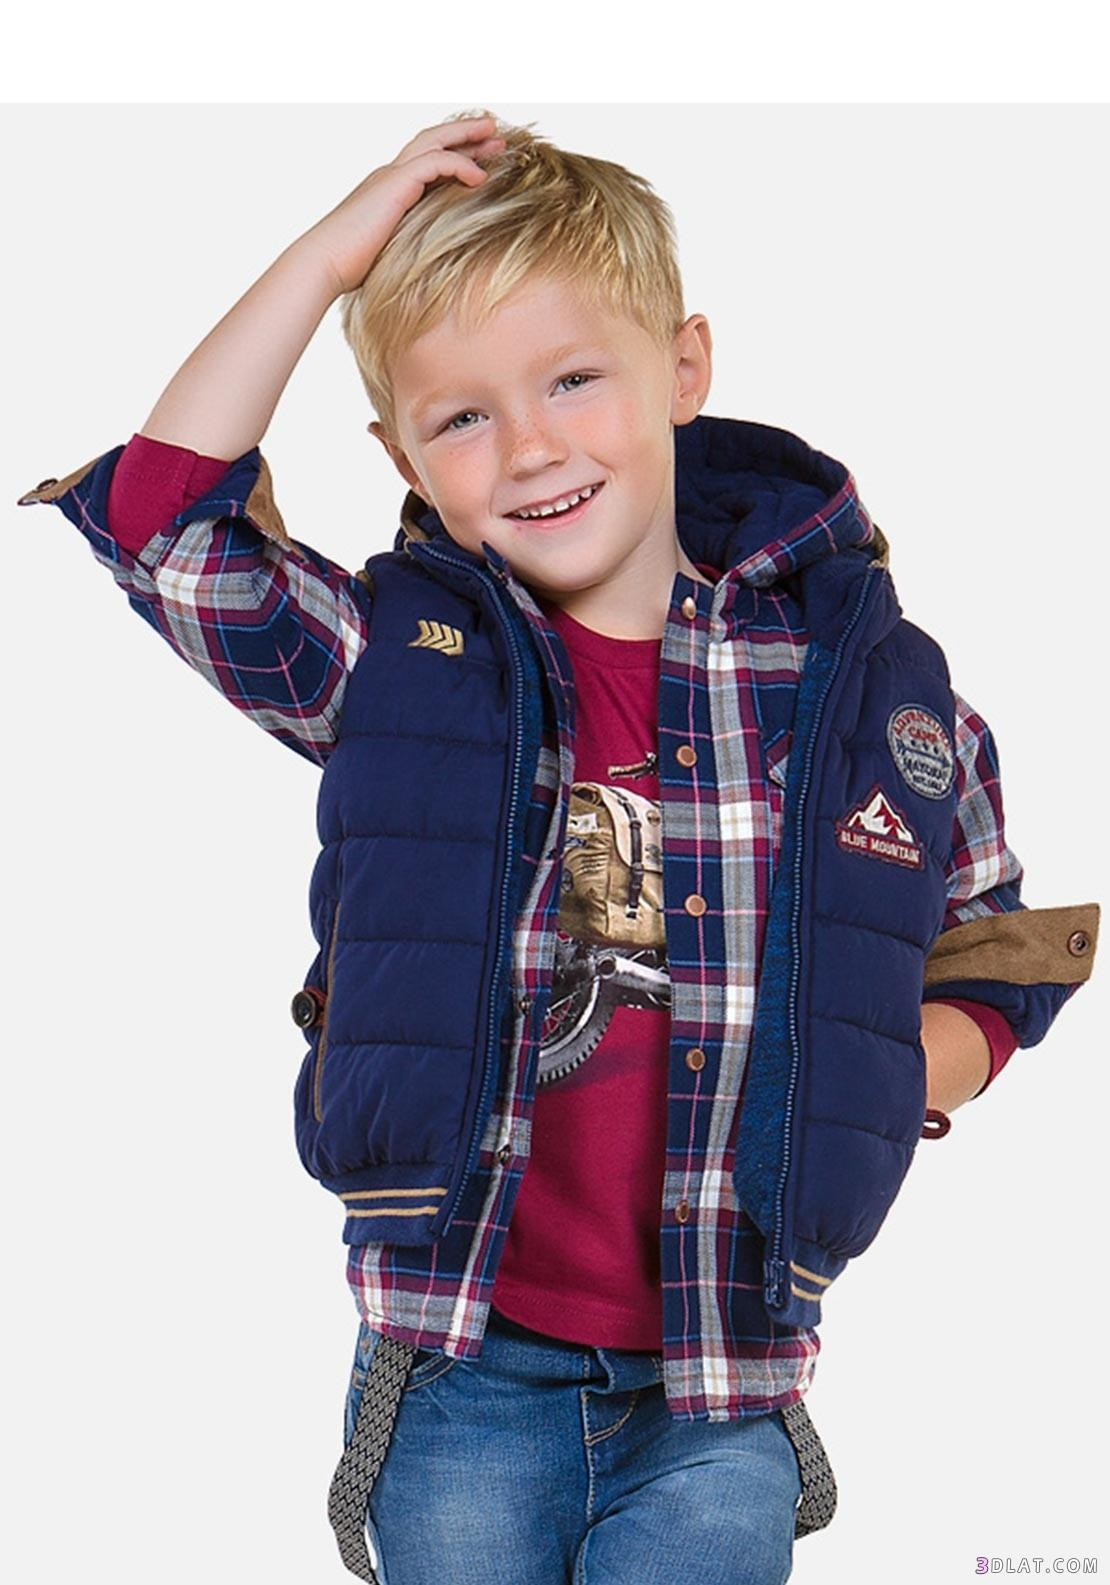 cc5f2ff5d أرقى ملابس أطفال أولاد شتاء 2020 , أجمل ملابس أطفال أولاد , ملابس ...